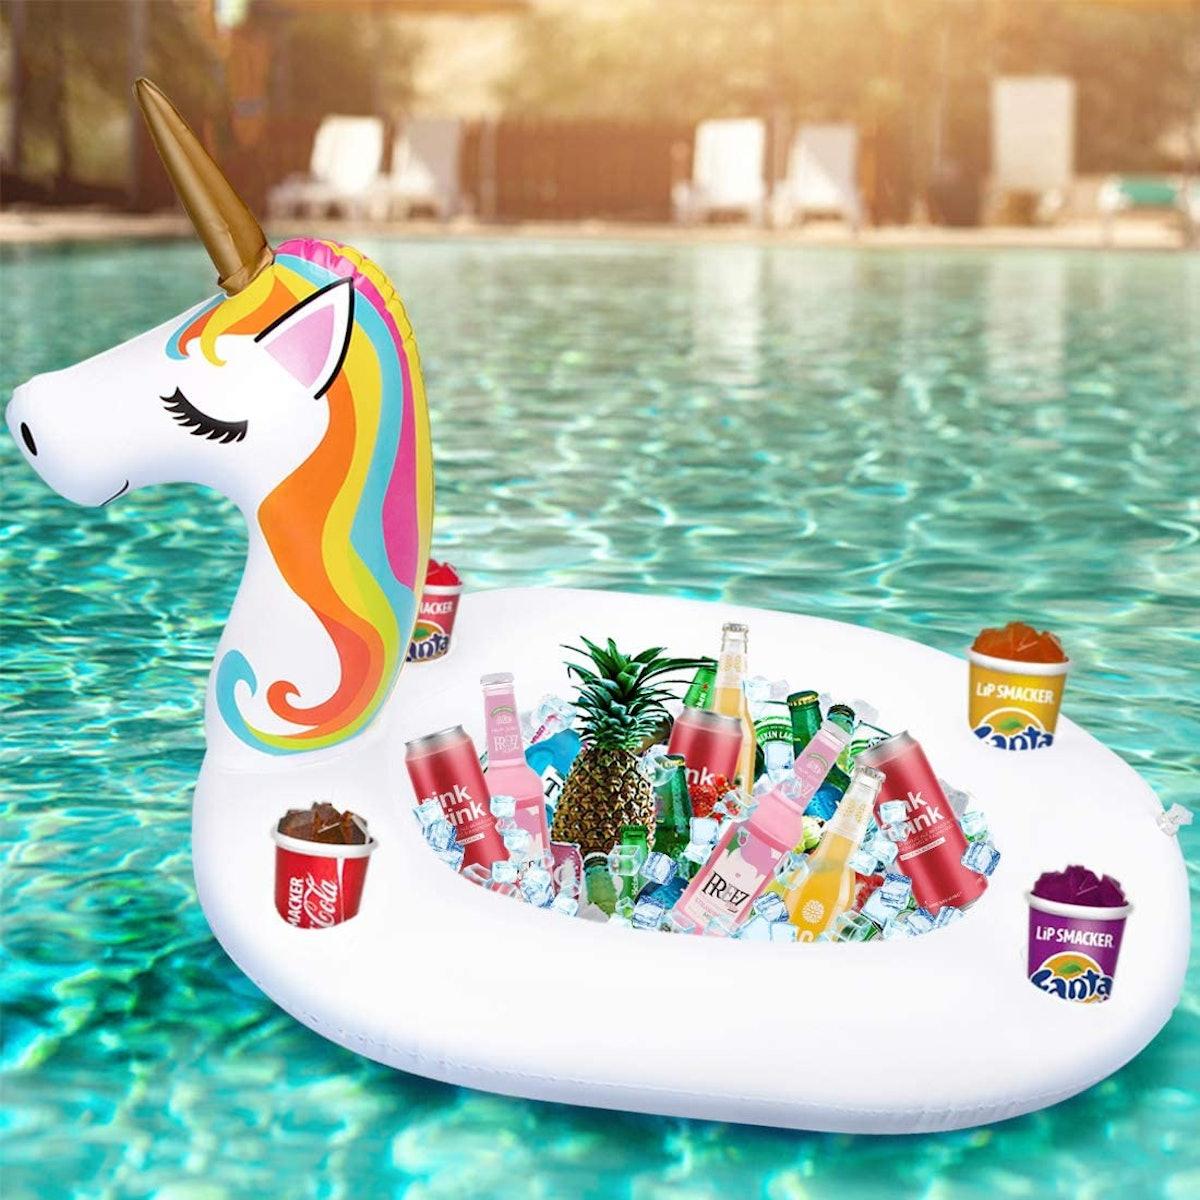 90shine Inflatable Unicorn Serving Bar